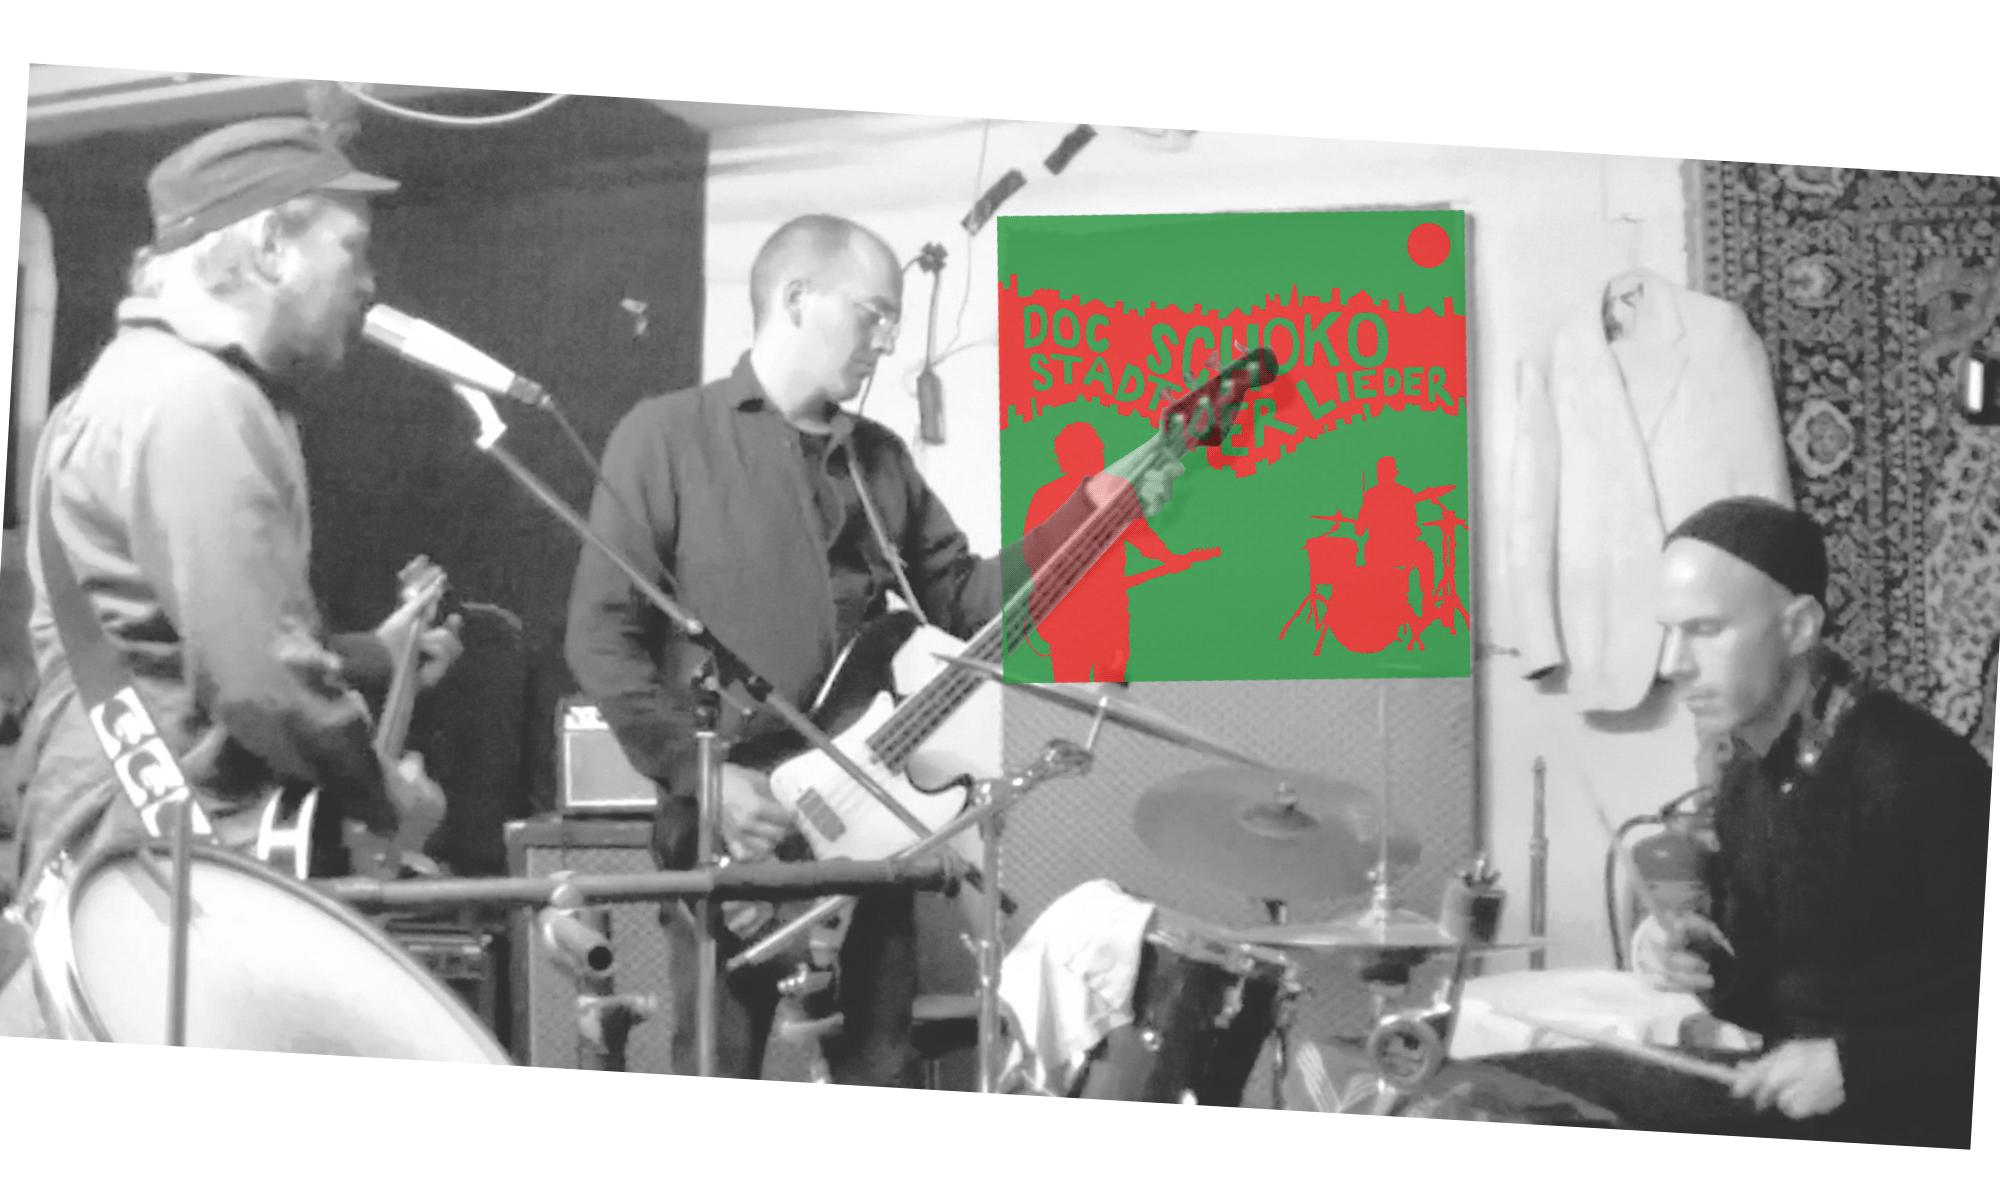 Doc Schoko - Band aus Berlin